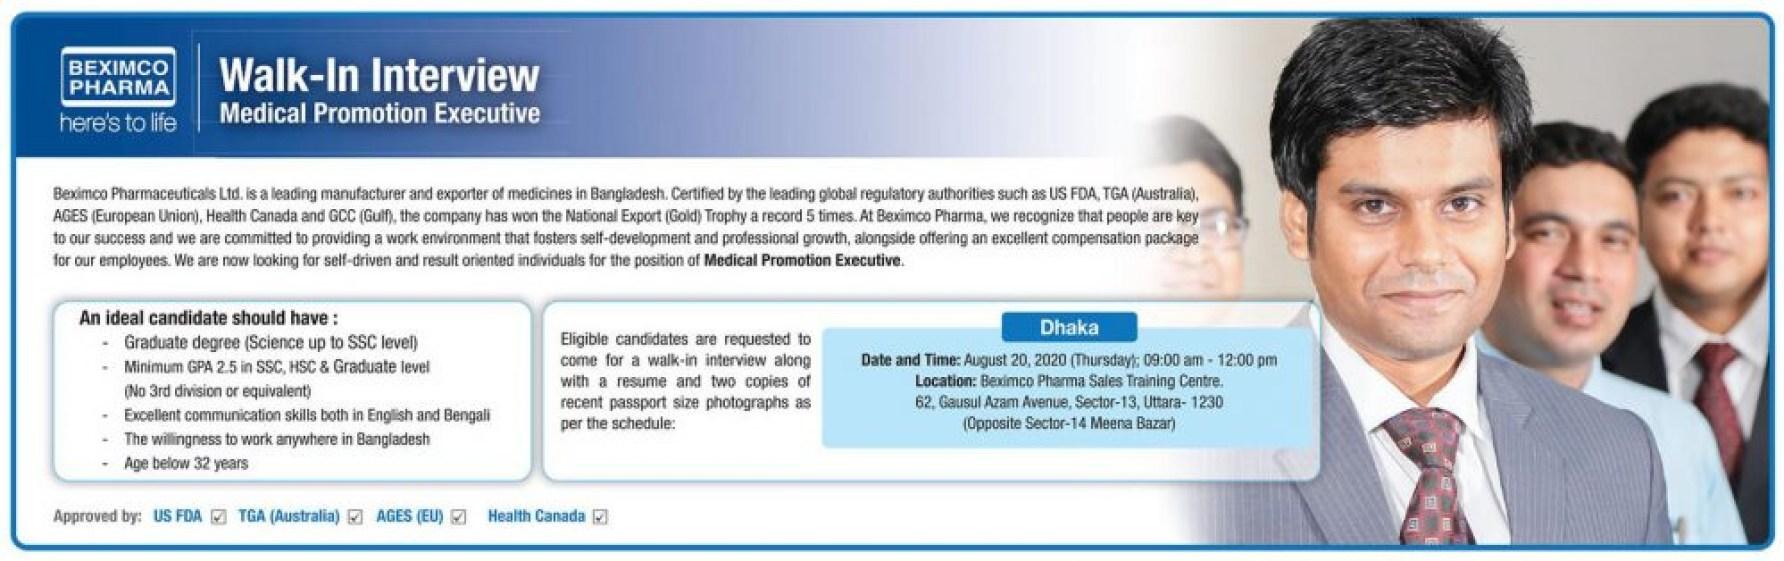 beximco-pharmaceuticals-medical-promotion-executive